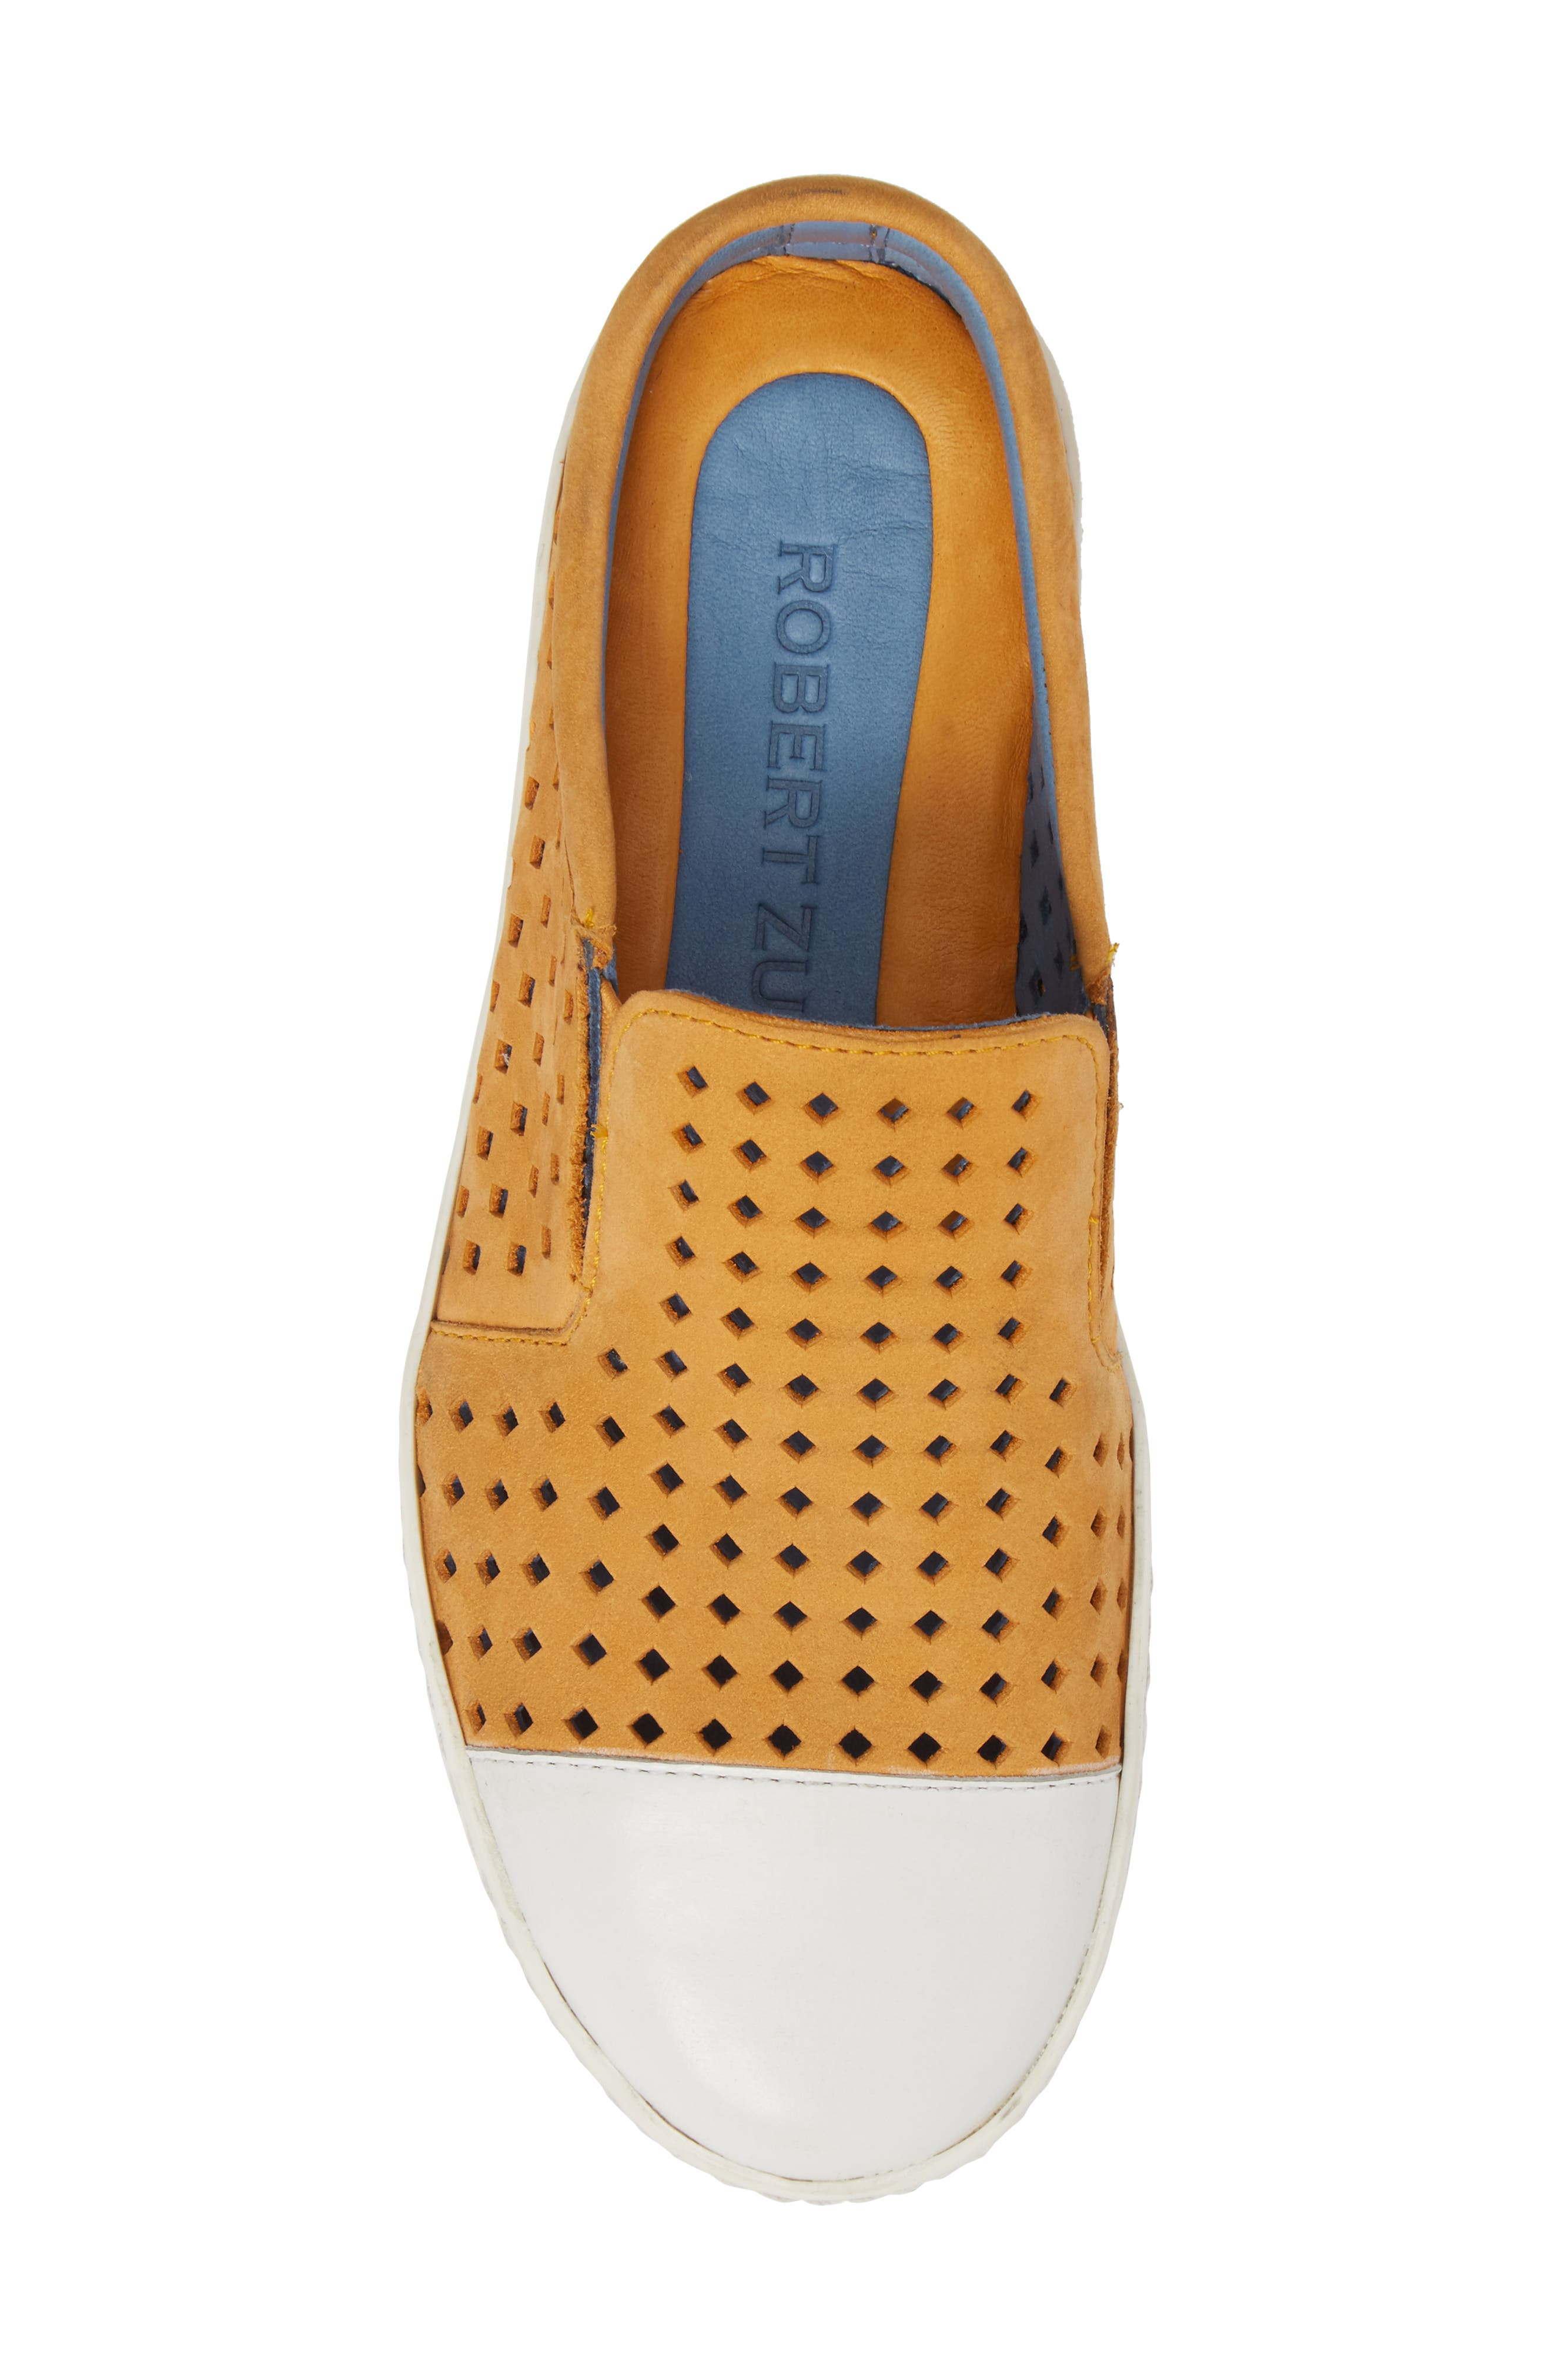 Tippy Slip-On Sneaker,                             Alternate thumbnail 5, color,                             Saffon Suede